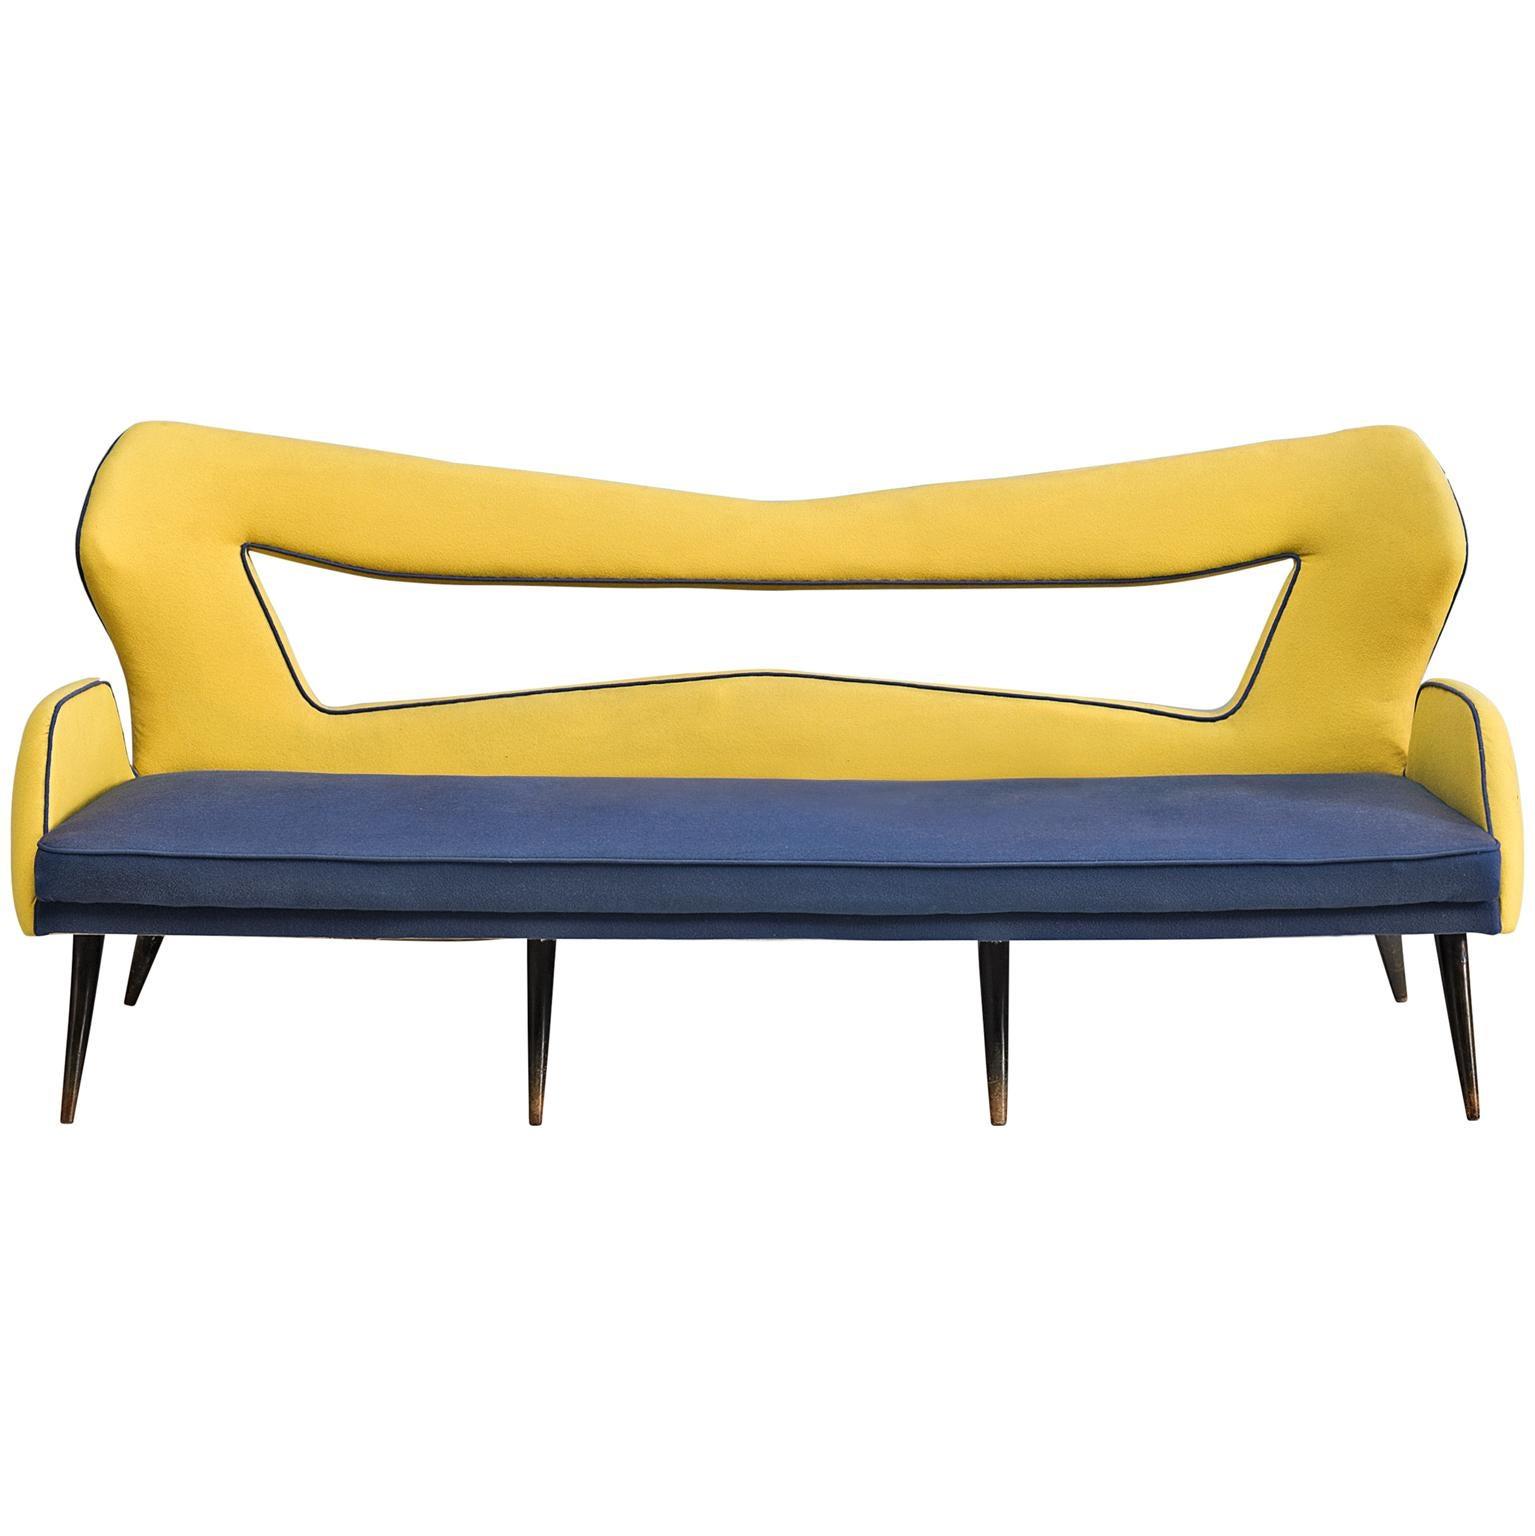 post modern furniture 3 639 for sale at 1stdibs rh 1stdibs com post modern furniture store post modern furniture los angeles